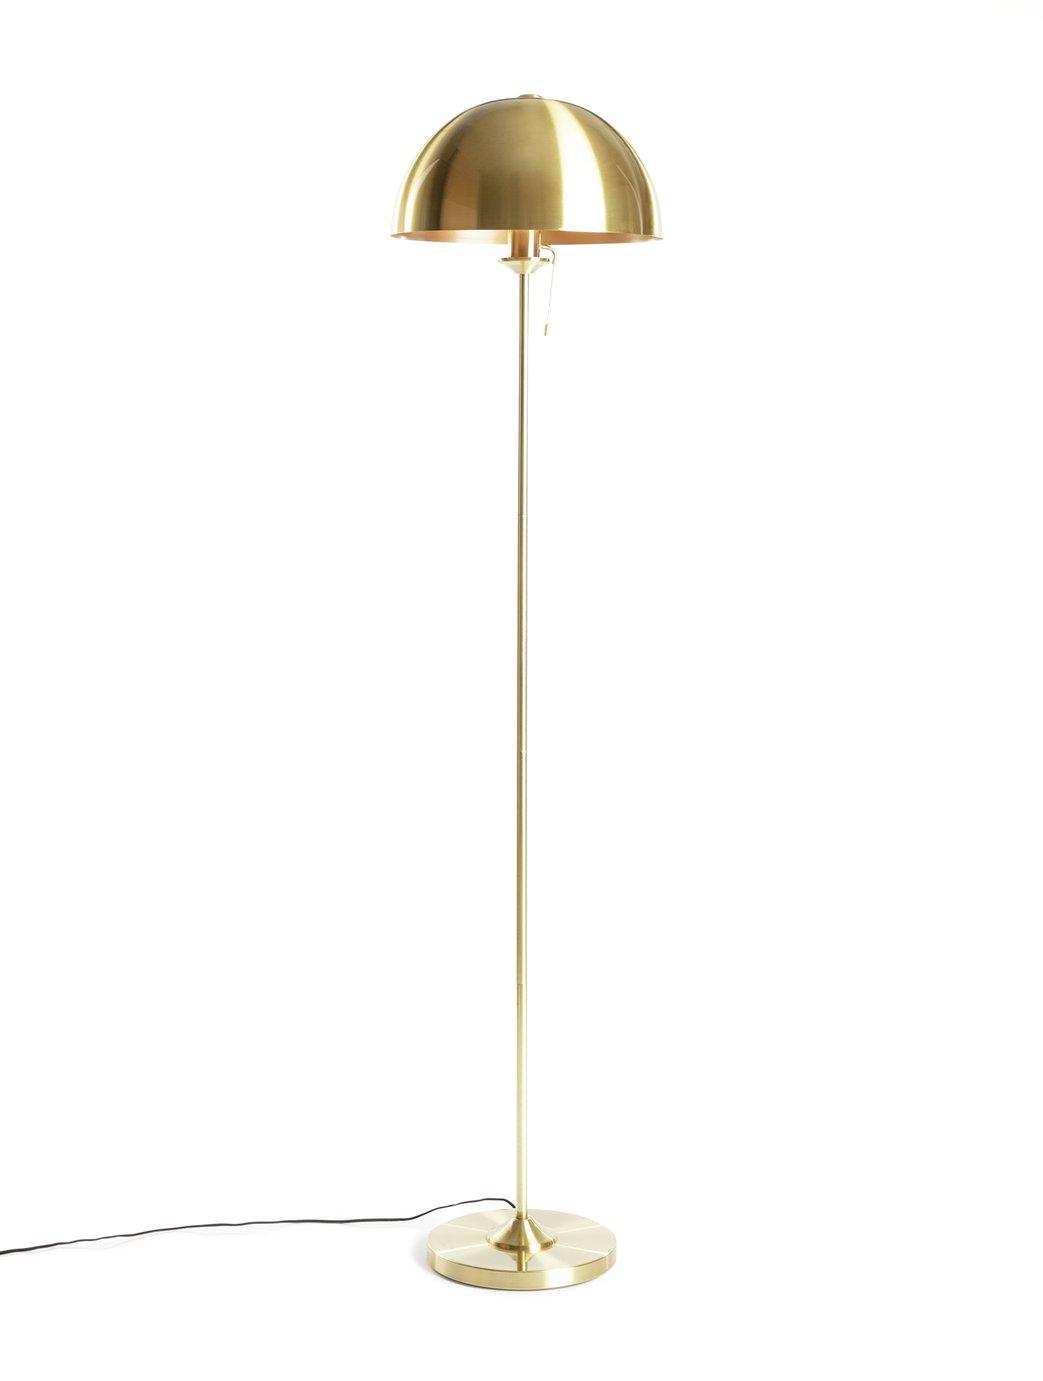 Habitat Mannor House Floor Lamp - Brass